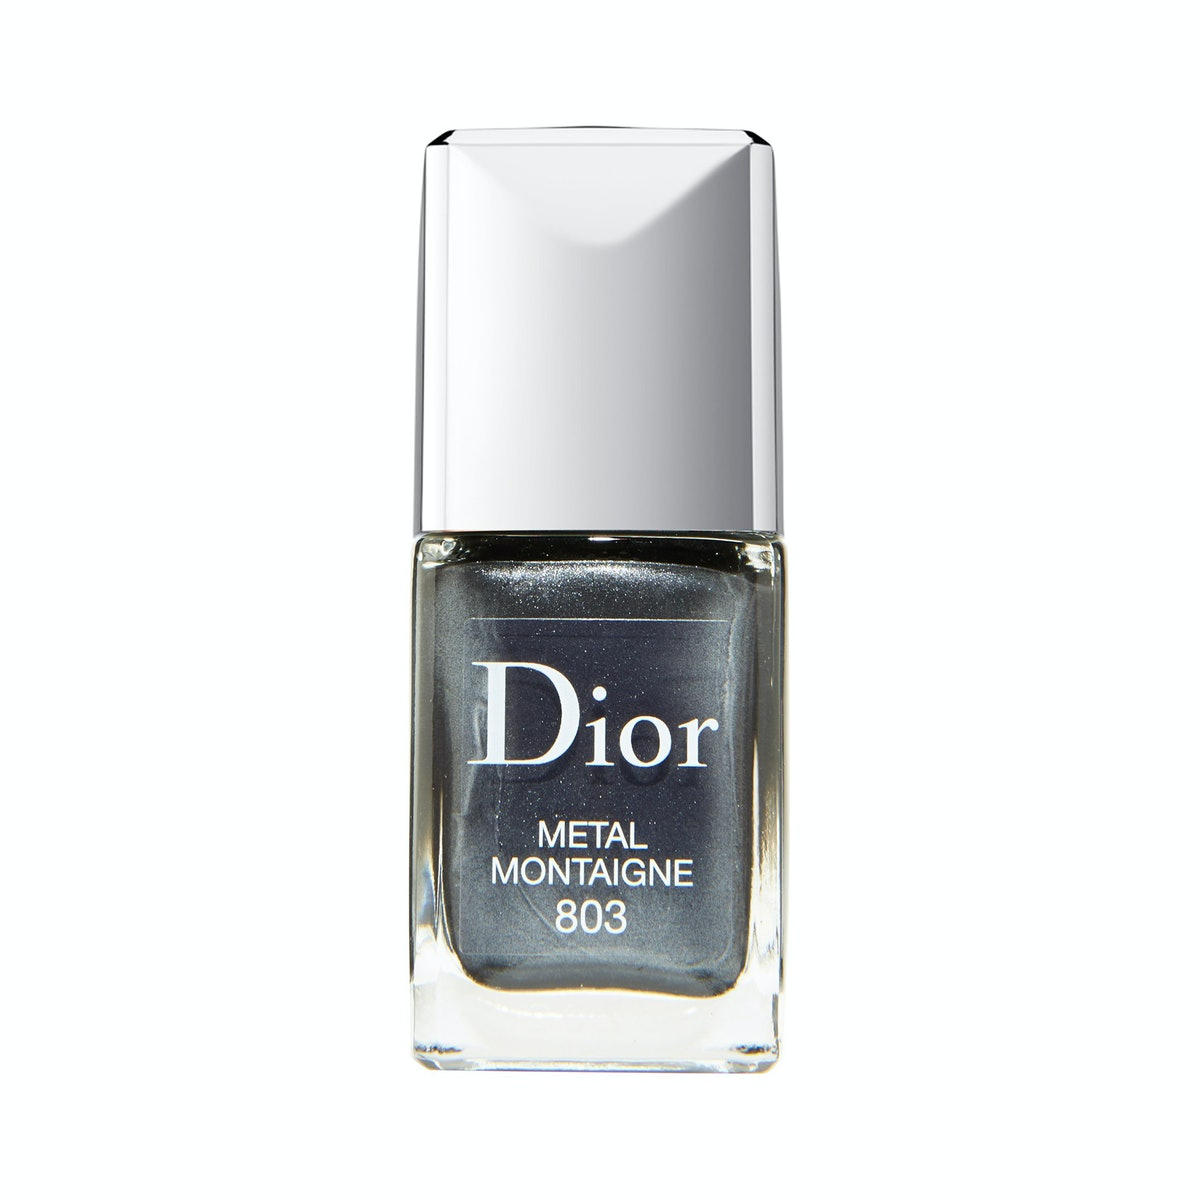 Dior nail polish in Metal Montaigne